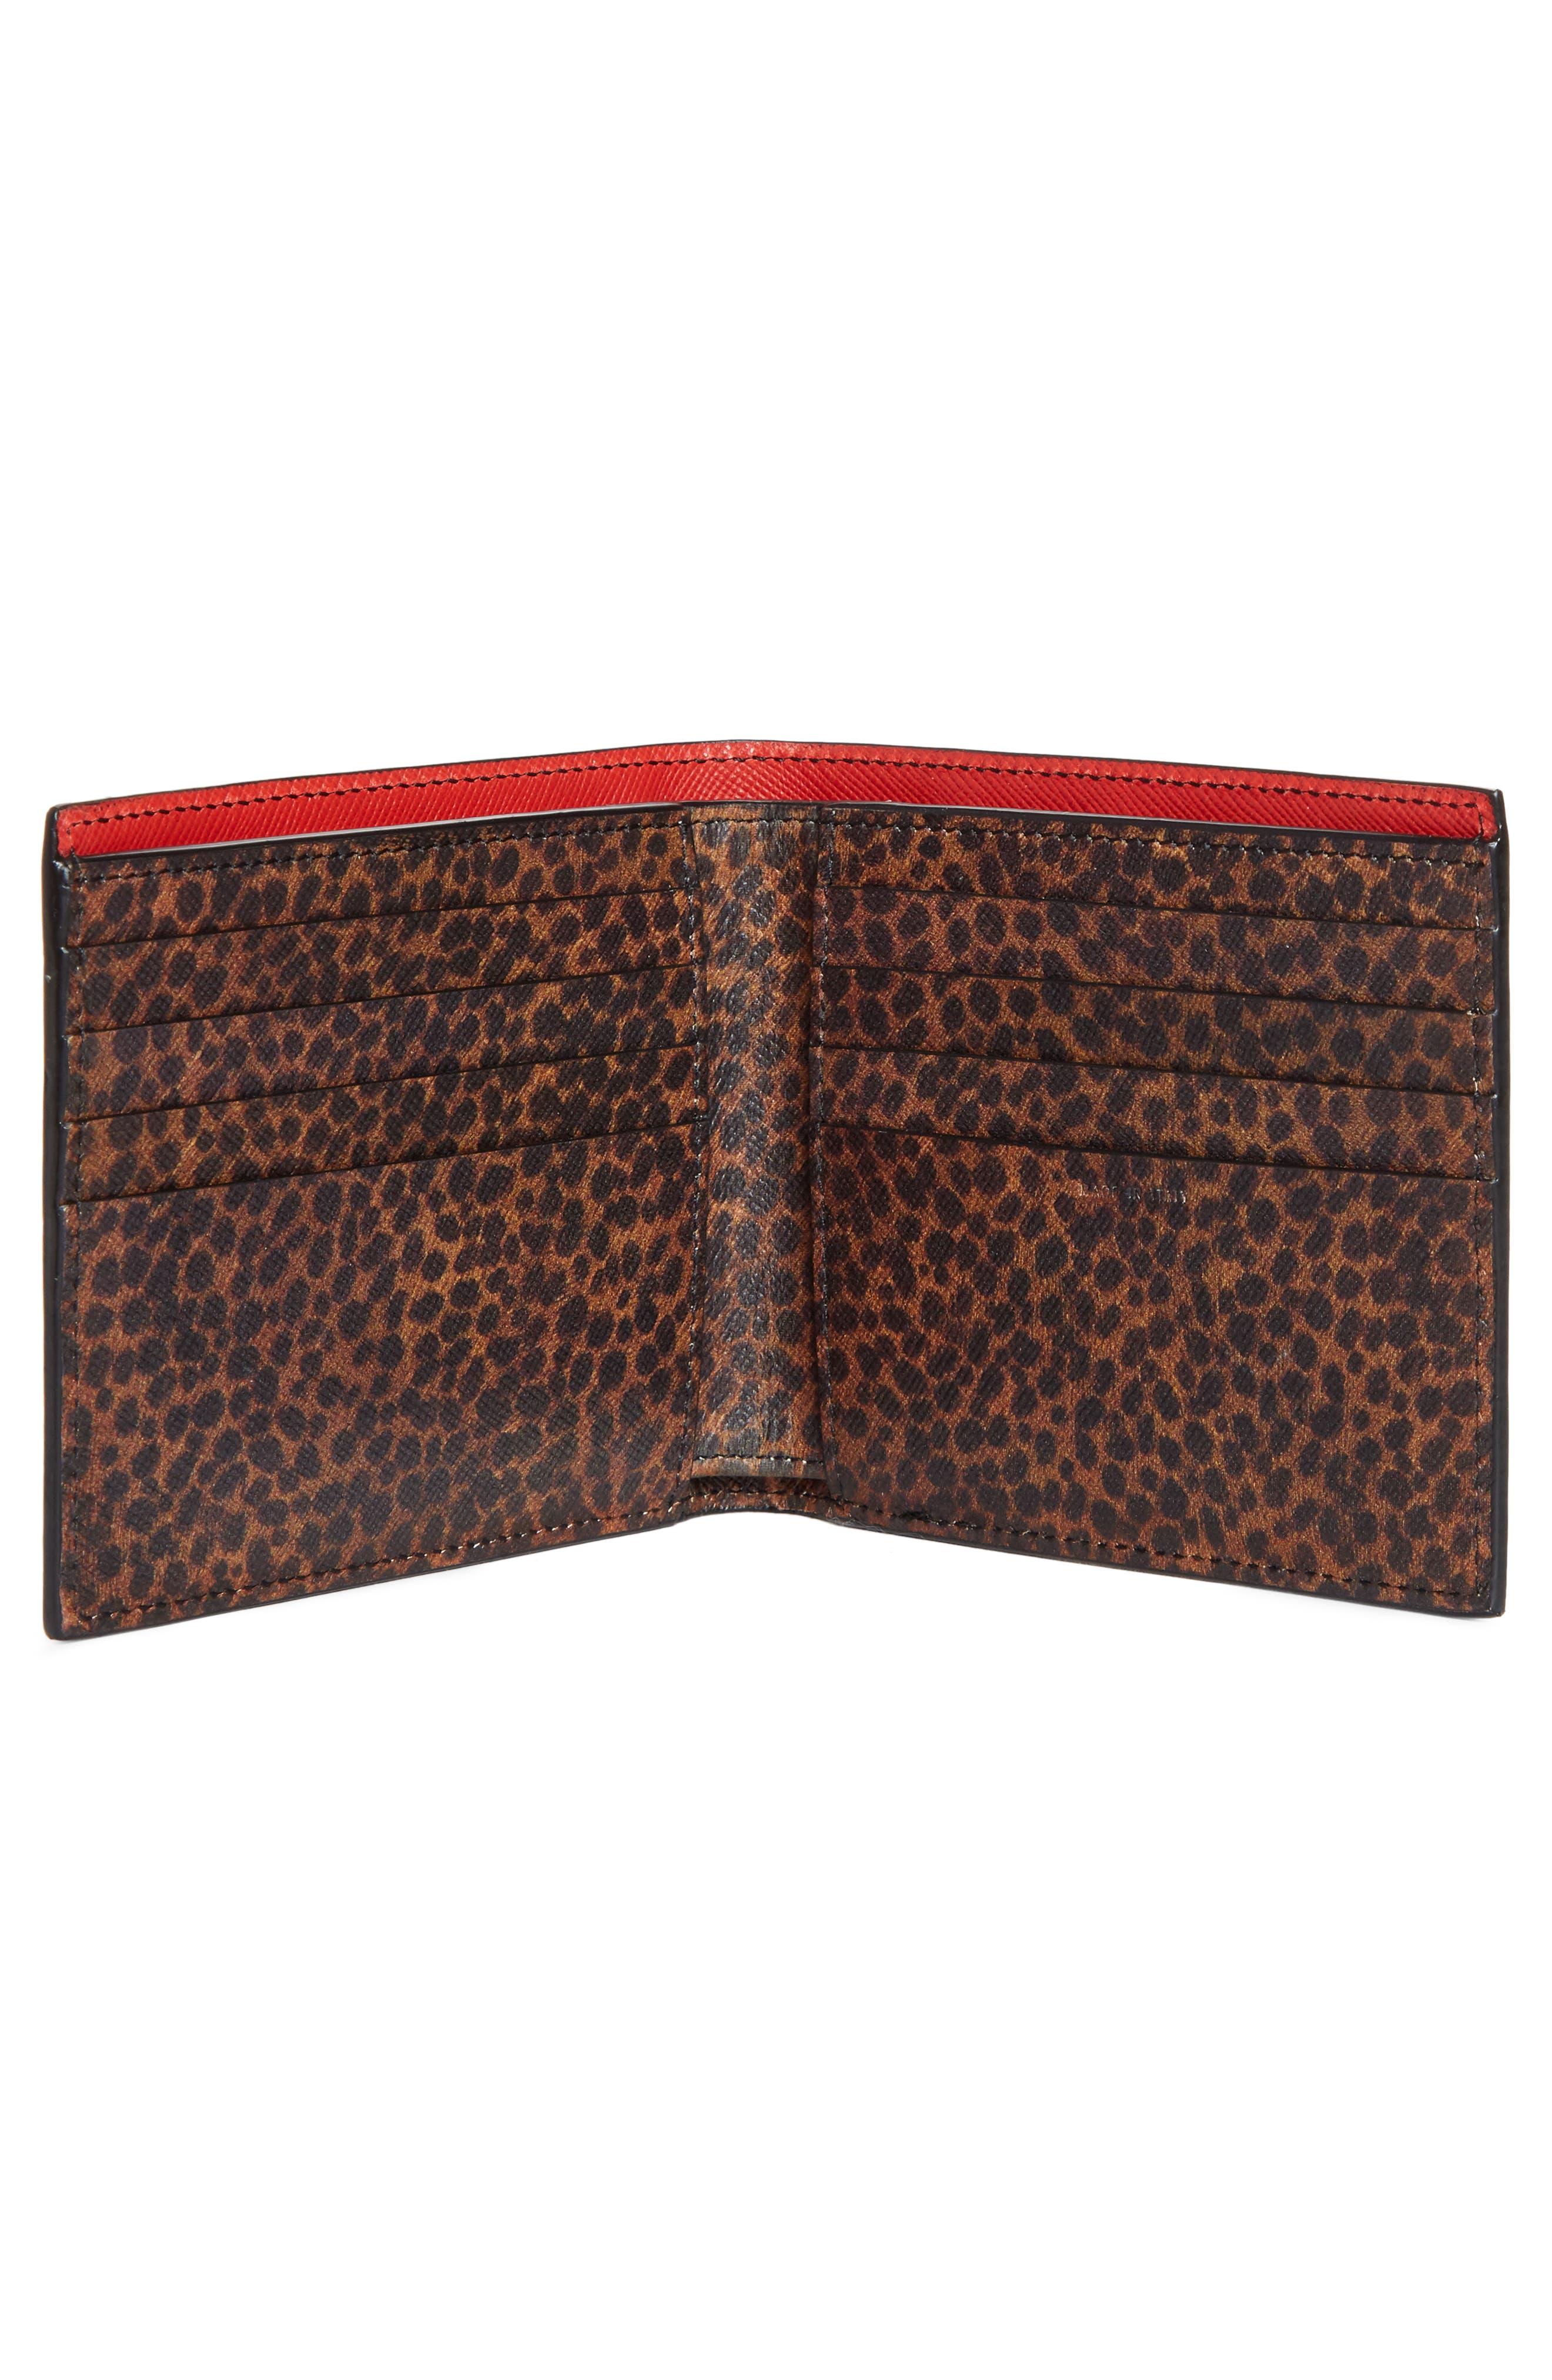 Leopard Print Billfold Wallet,                             Alternate thumbnail 2, color,                             001